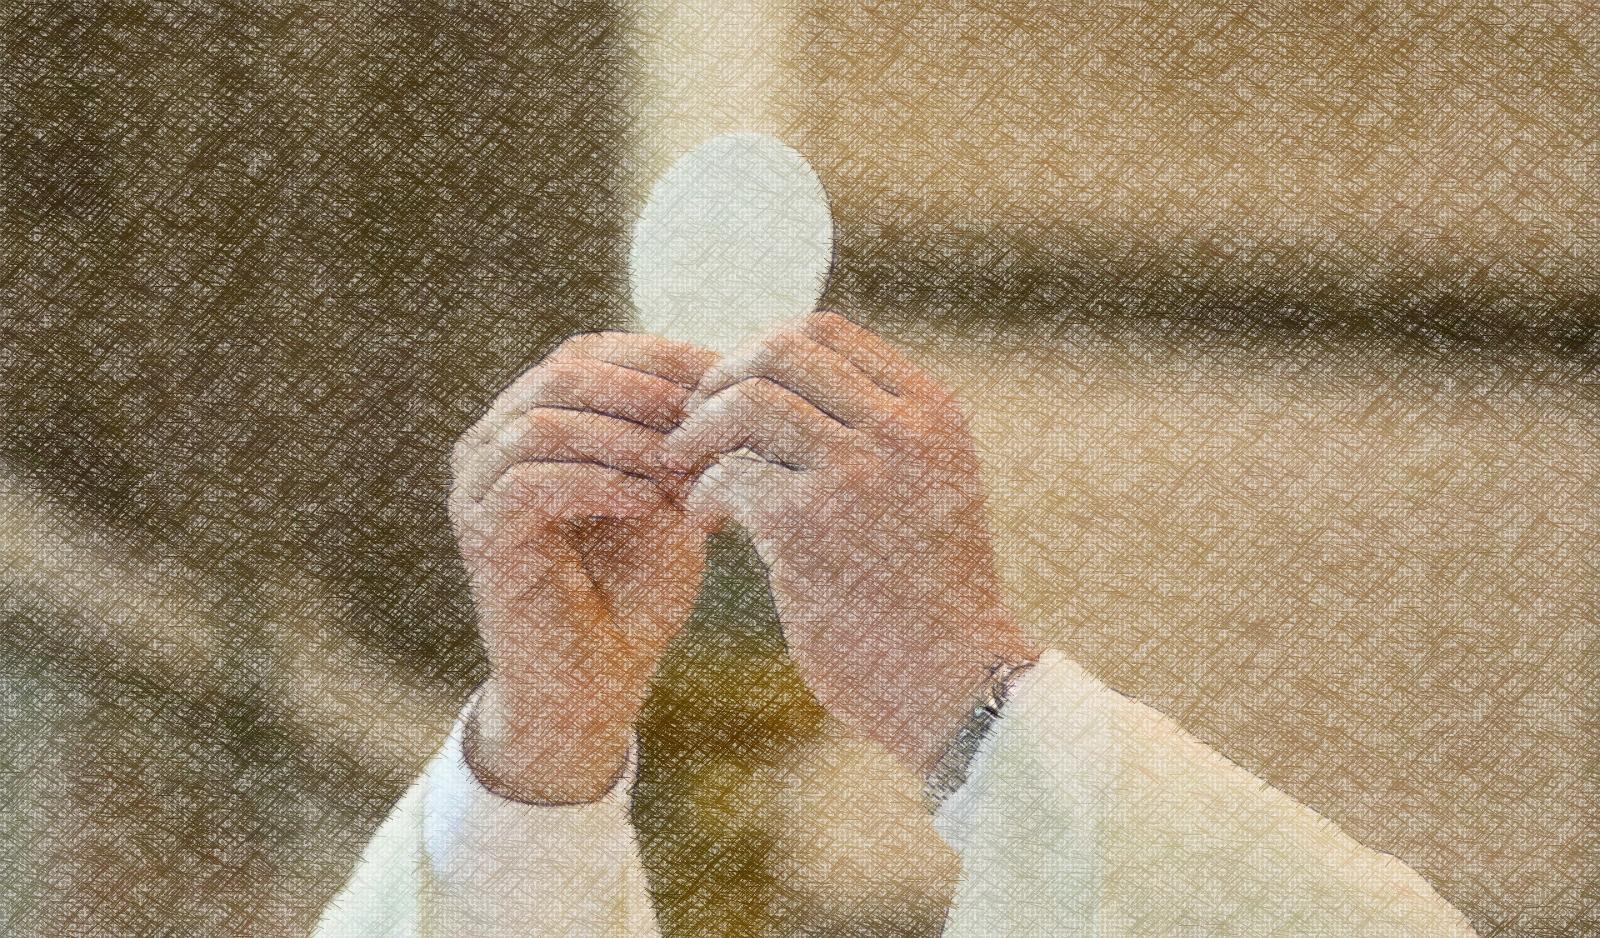 sacerdote mostrando la hostia